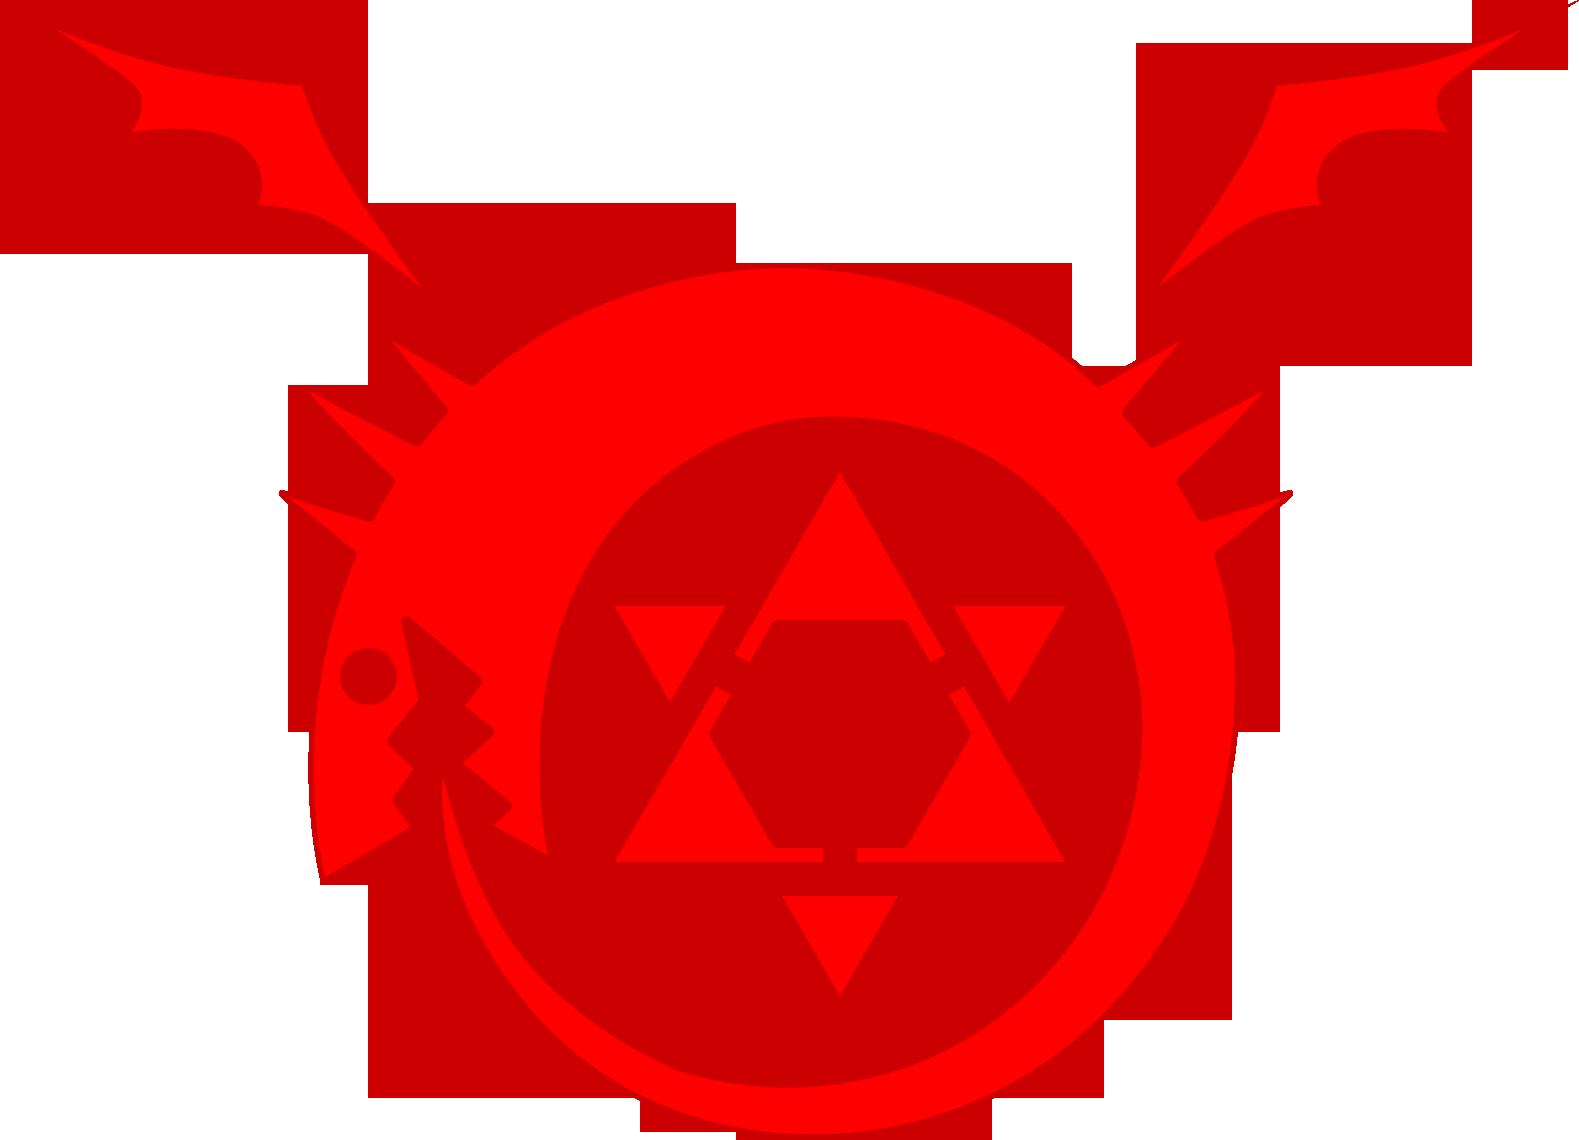 Fullmetal alchemist ouroboros symbol inkspiration pinterest fullmetal alchemist ouroboros symbol buycottarizona